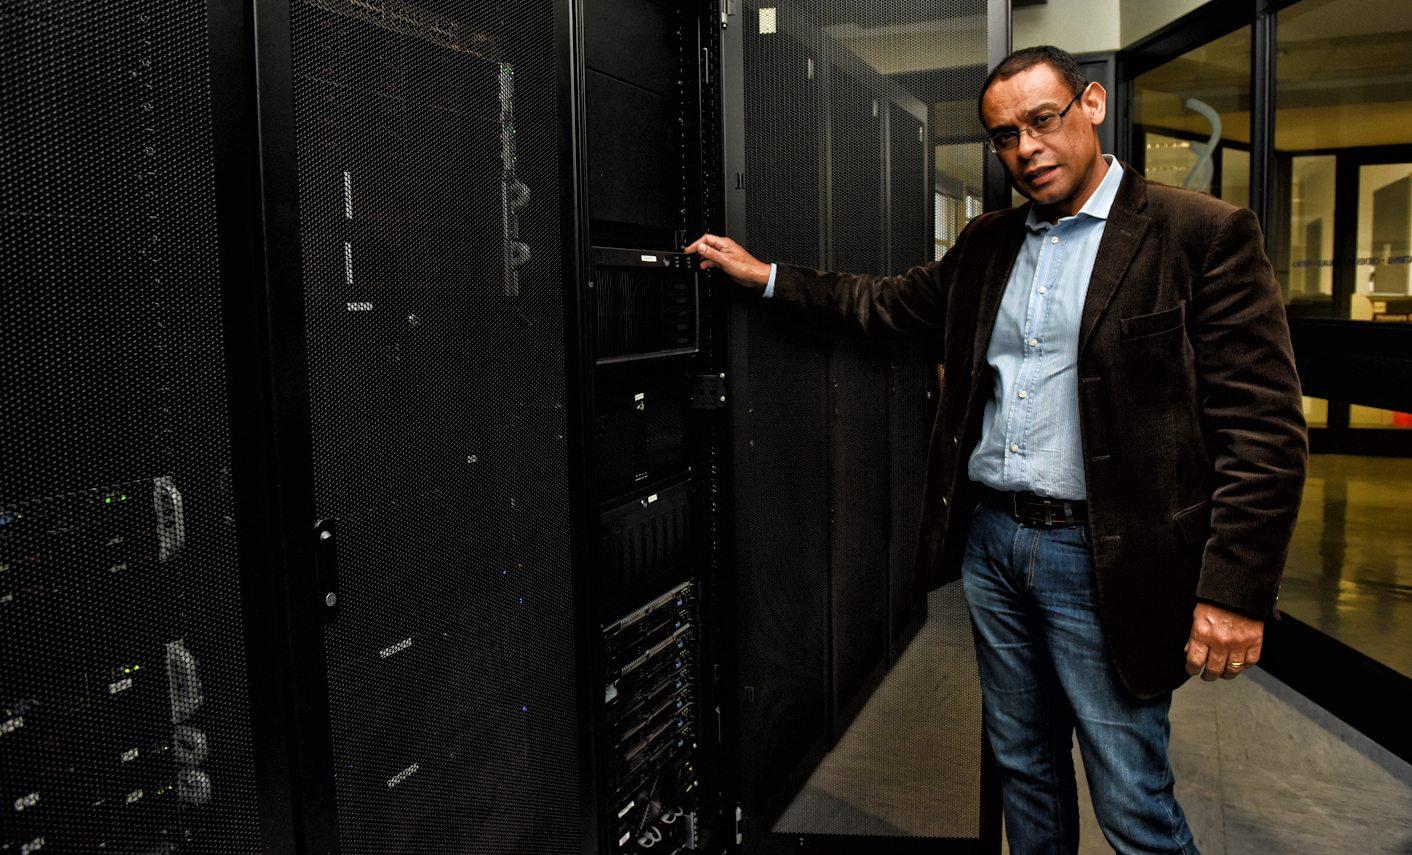 Cancer care meets big data: SA's latest treatment bre